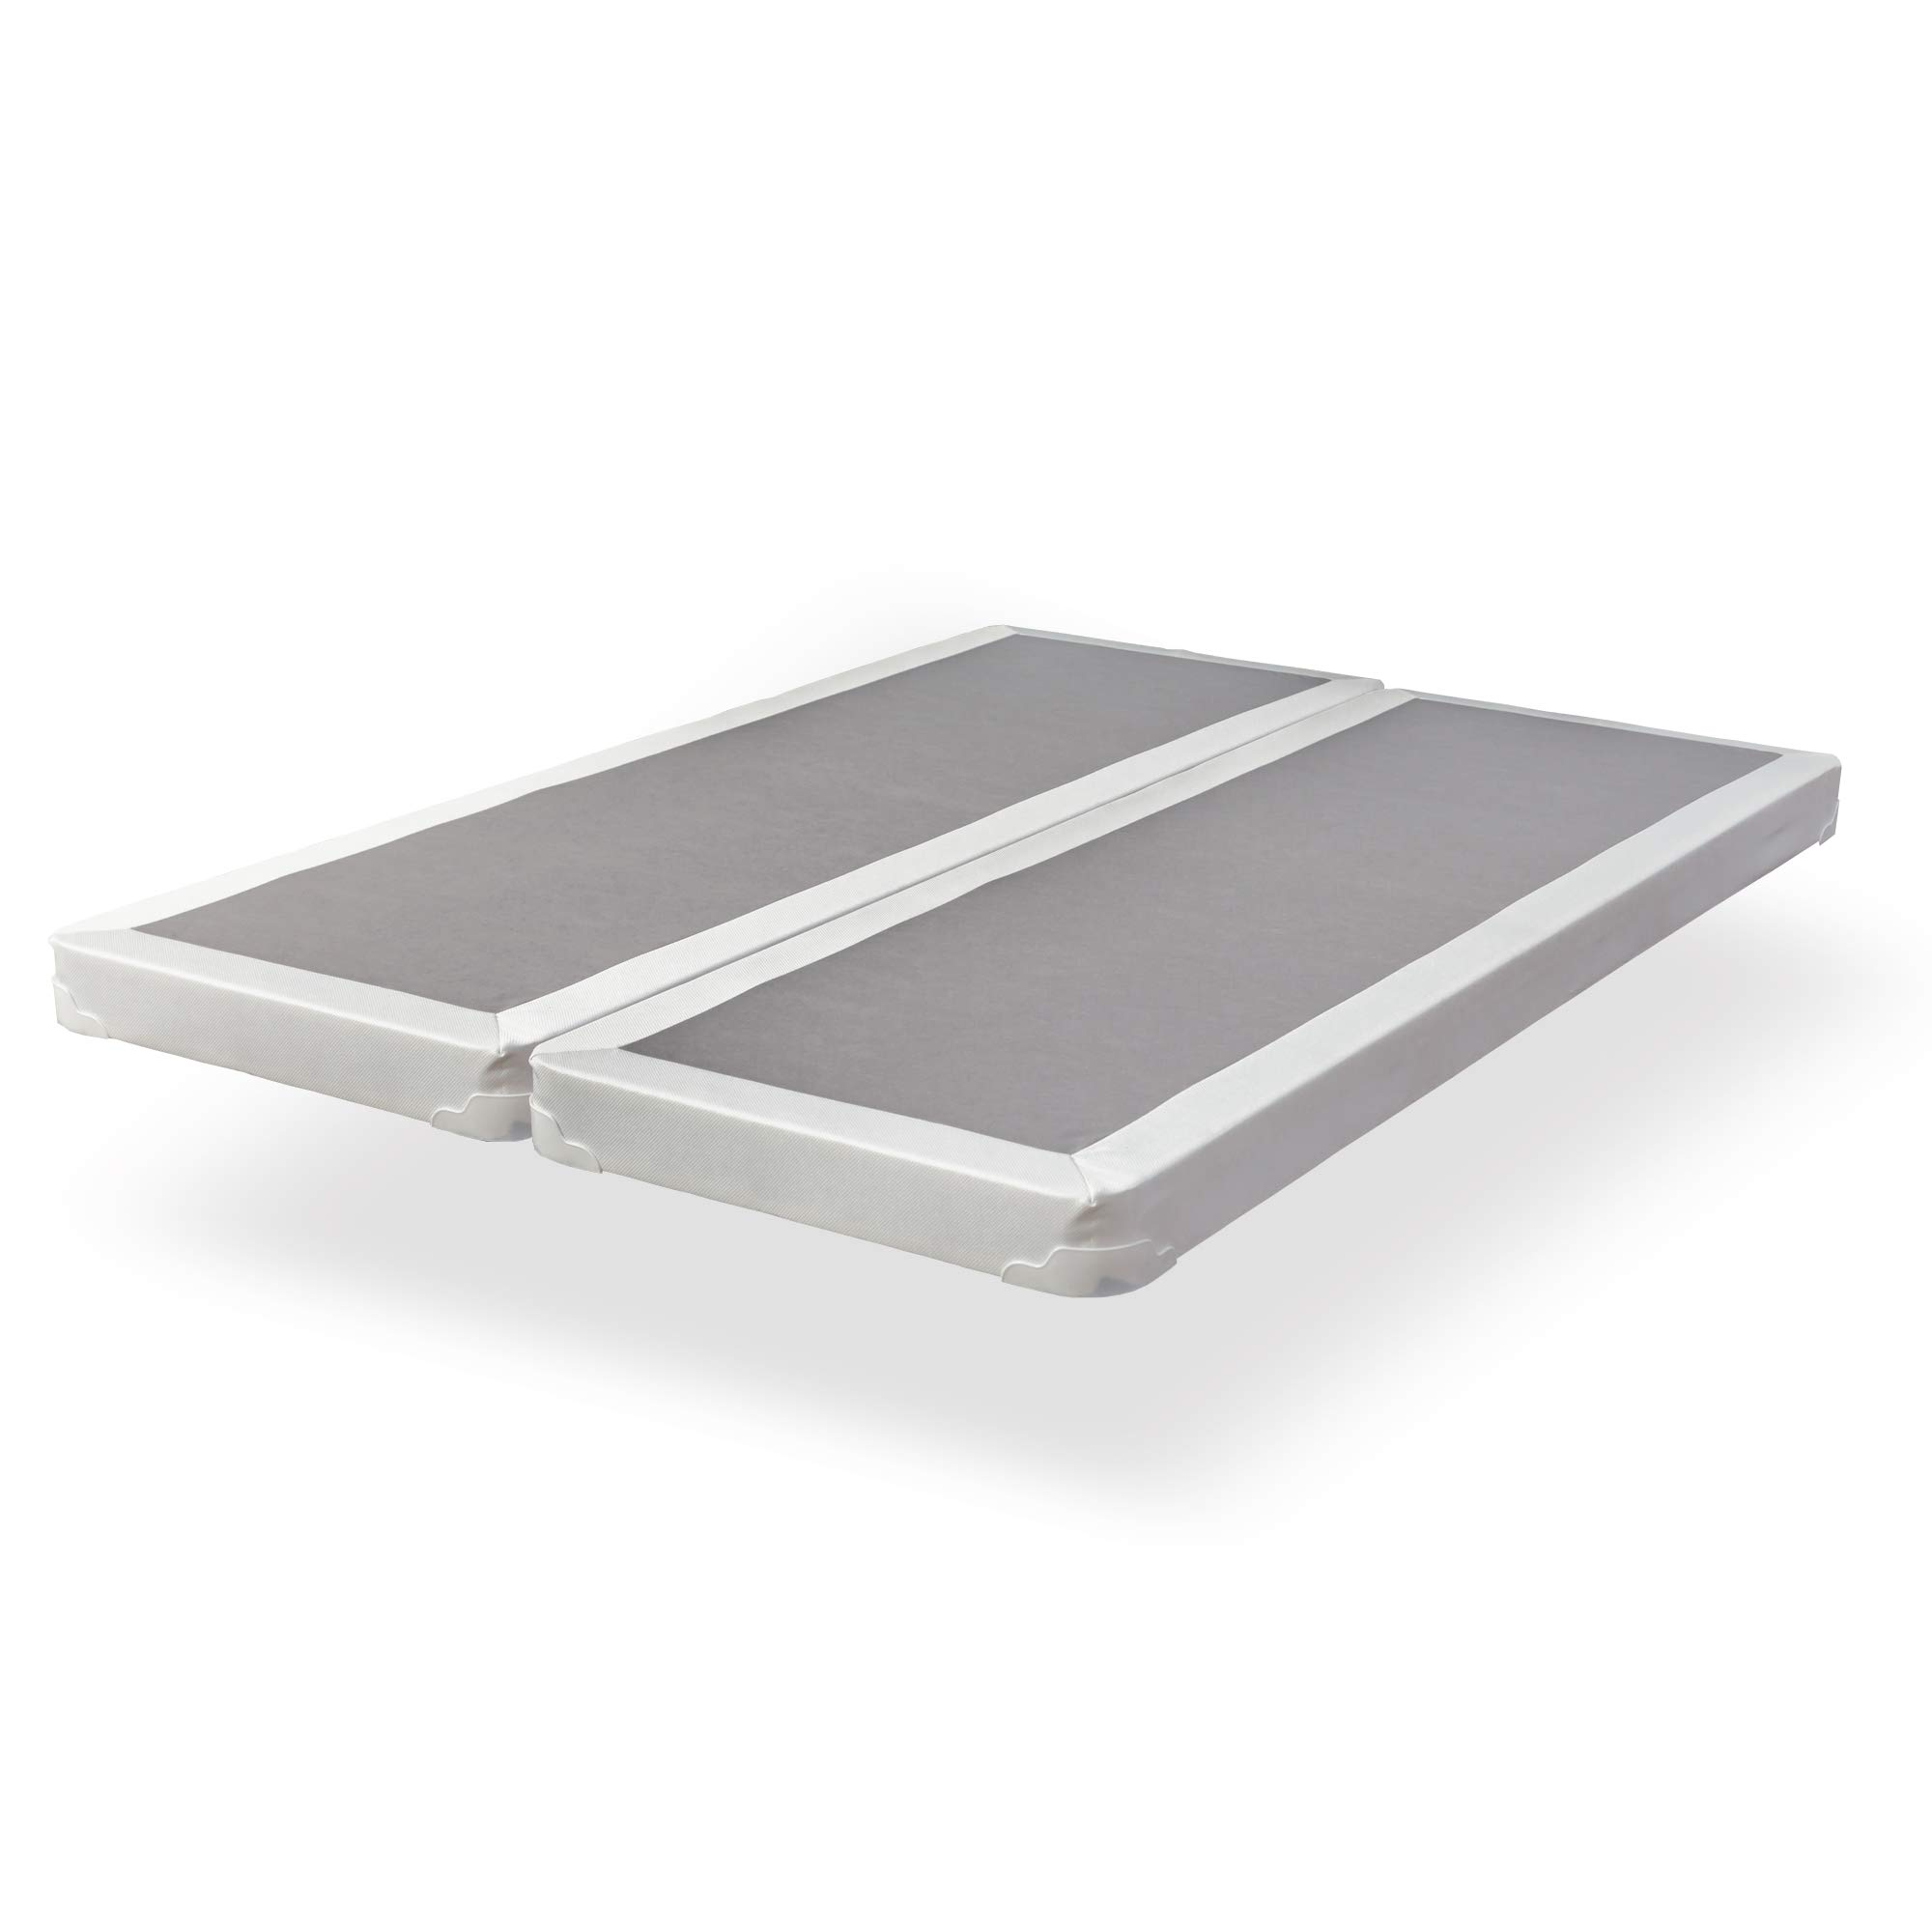 4-inch Foundation Box Spring for Mattress